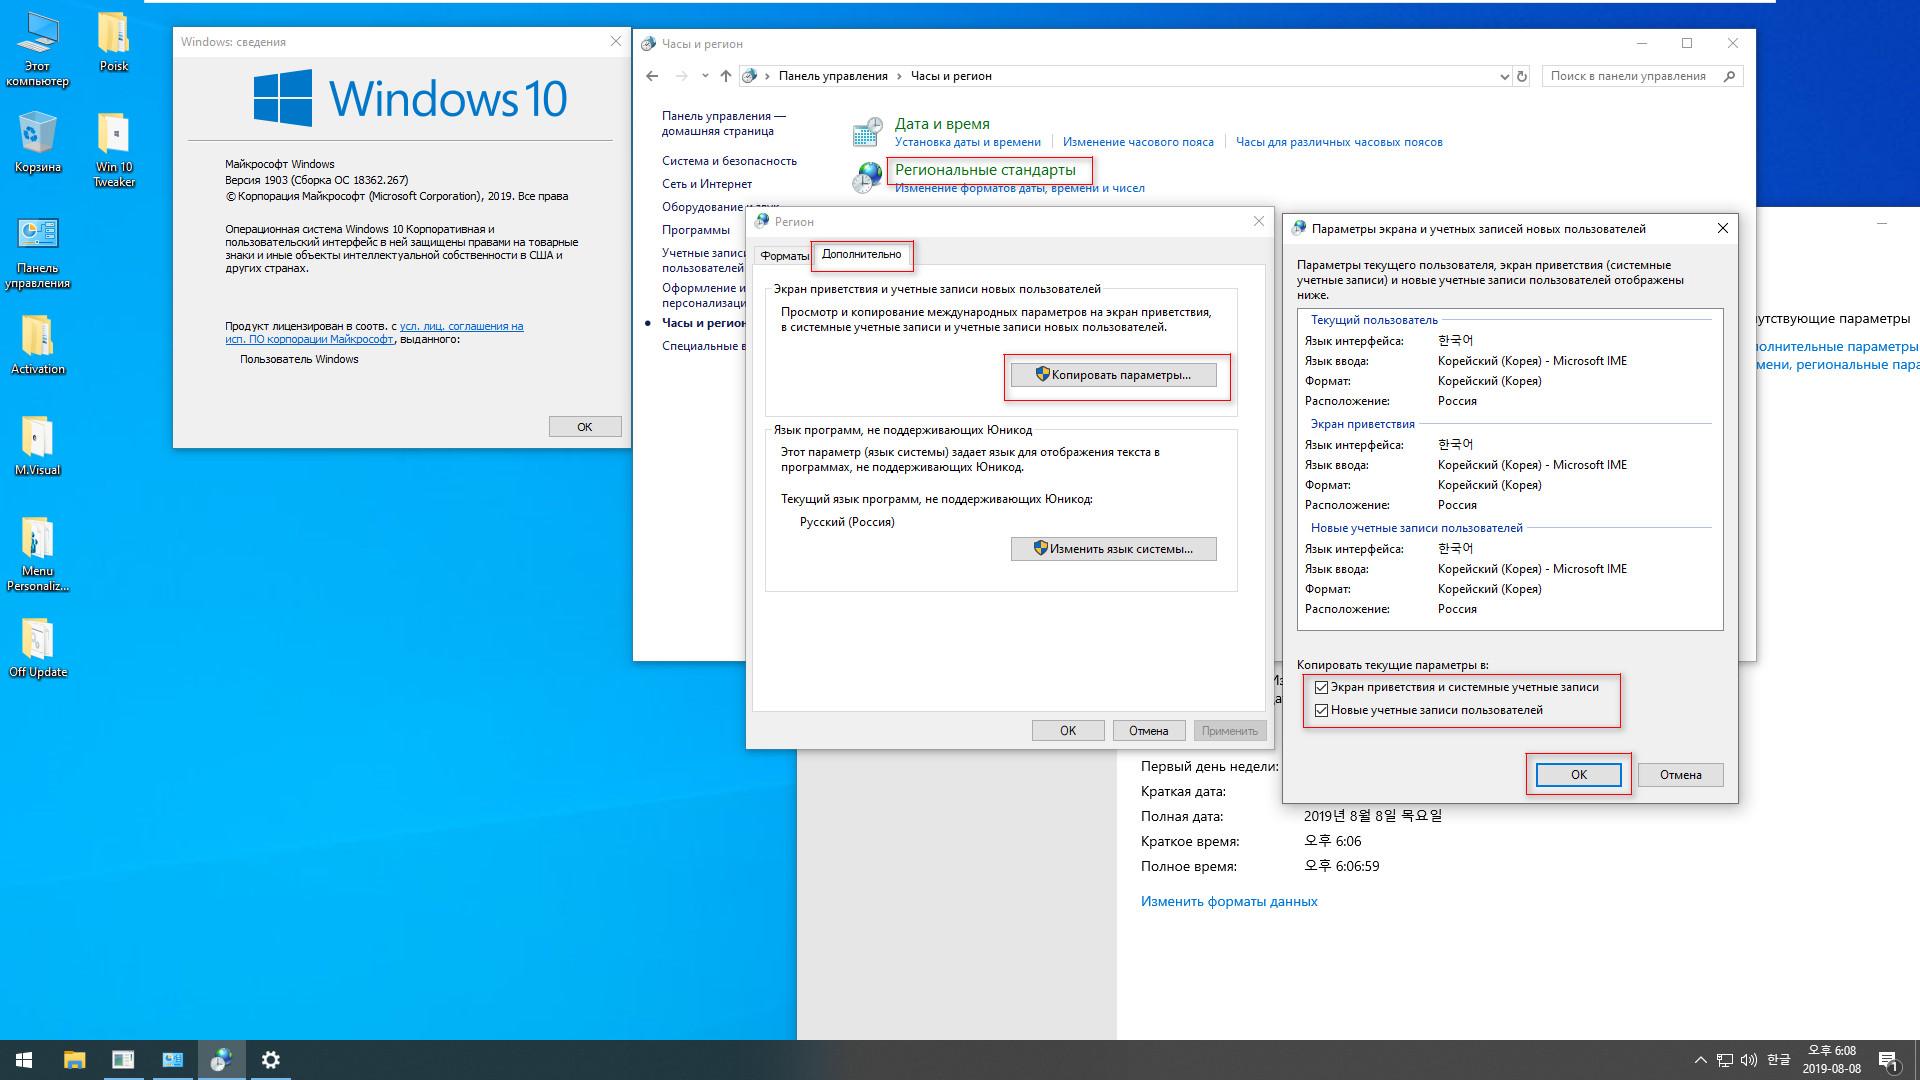 Windows 10 Enterprise x64 lite 1903 build 18362.267 by Zosma.iso - 러시아어 한글화 시도 - 그래서 그냥 원본대로 설치 후에 한글화 시도 2019-08-09_000805.jpg